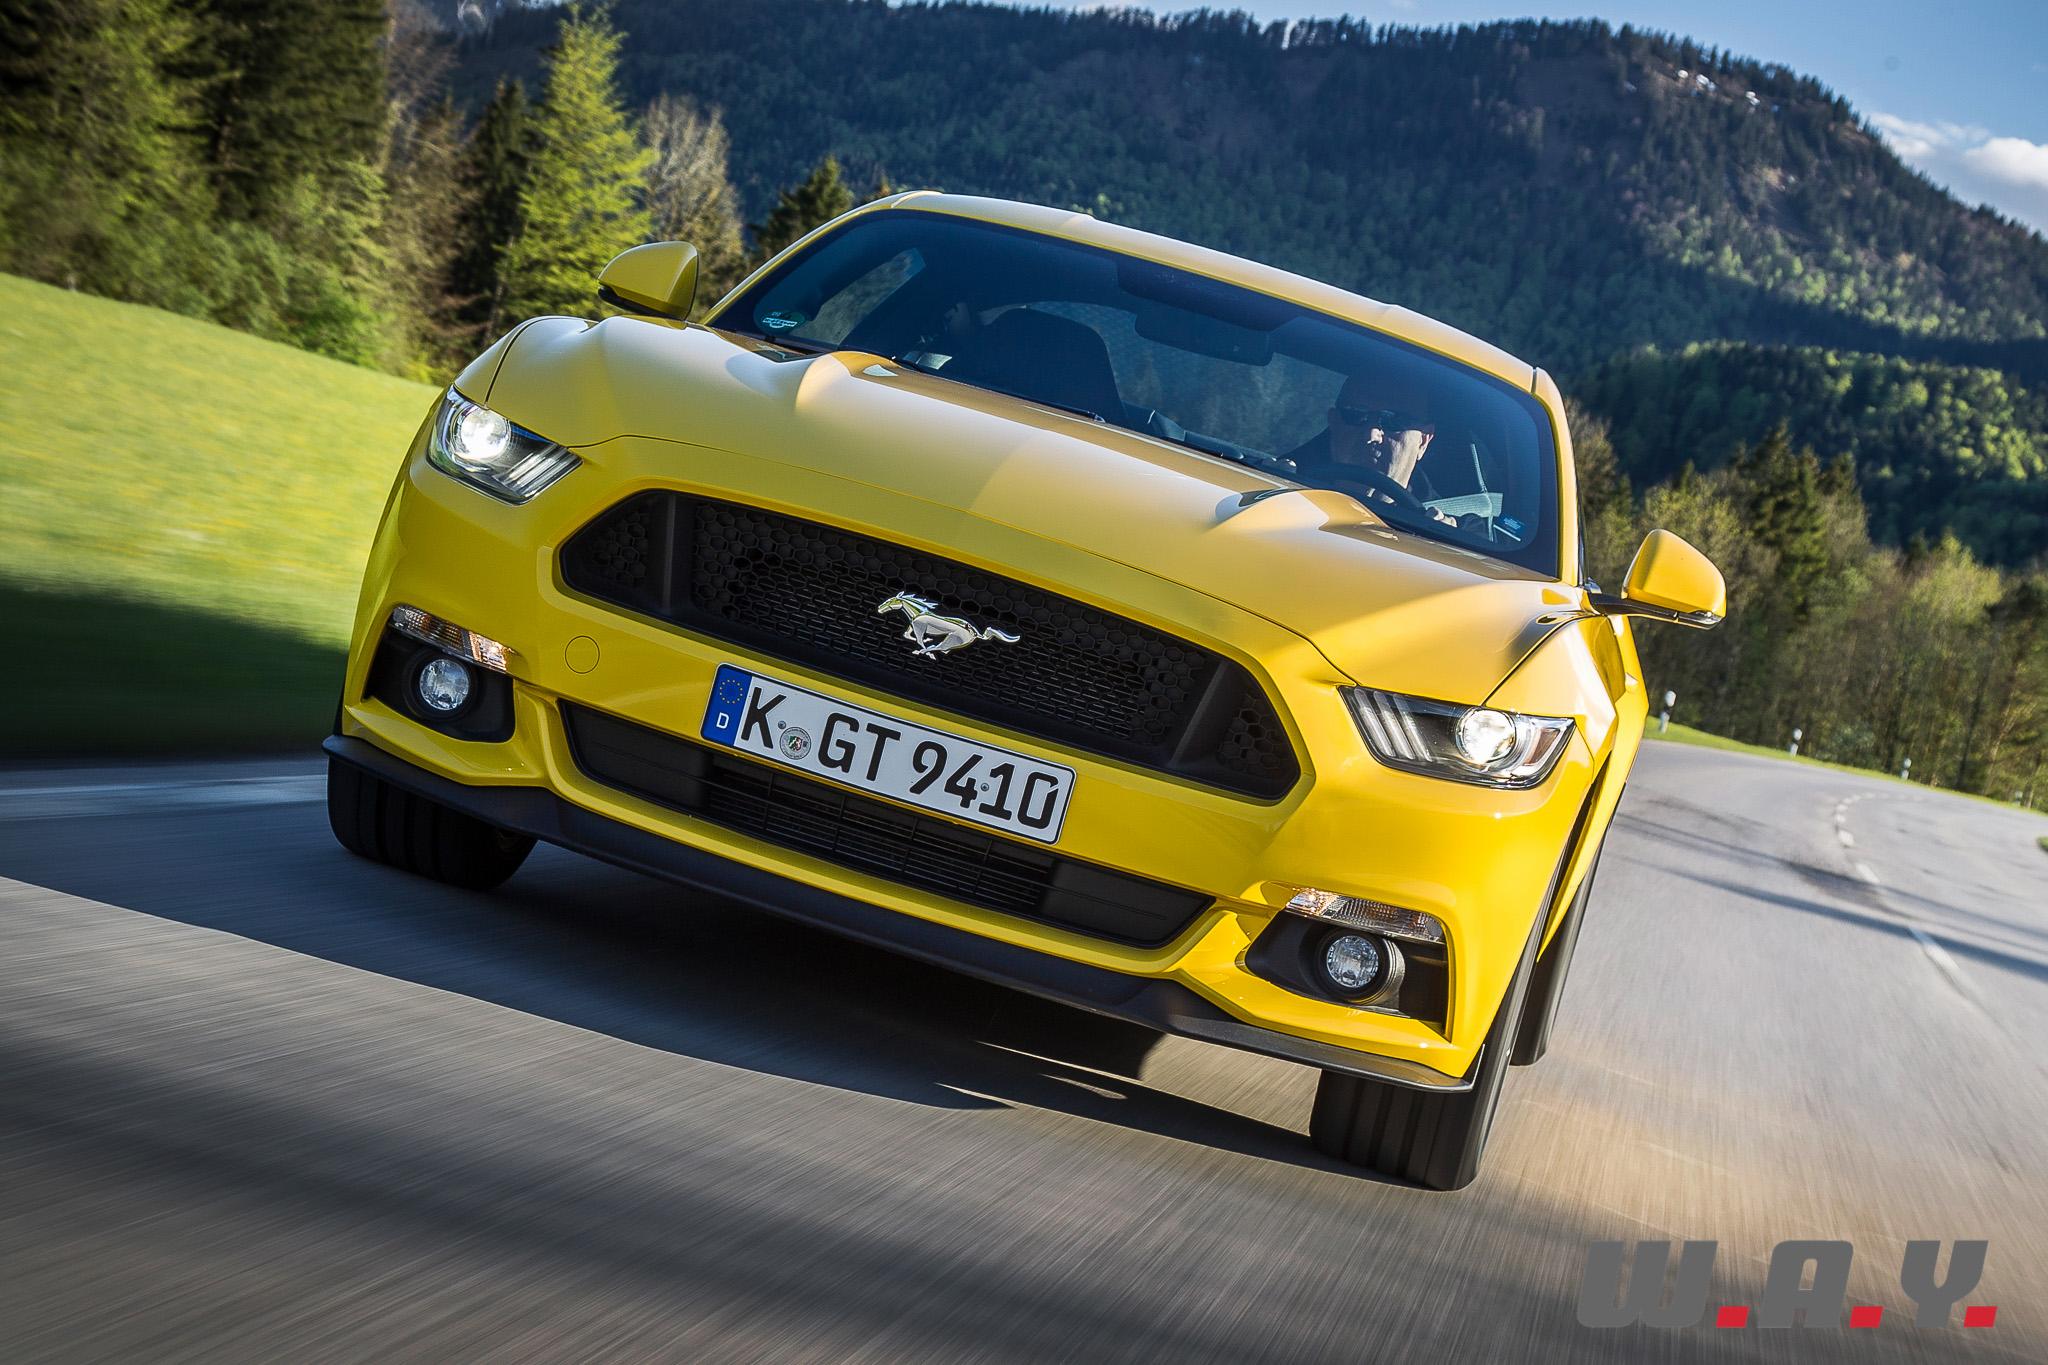 Mustang-04